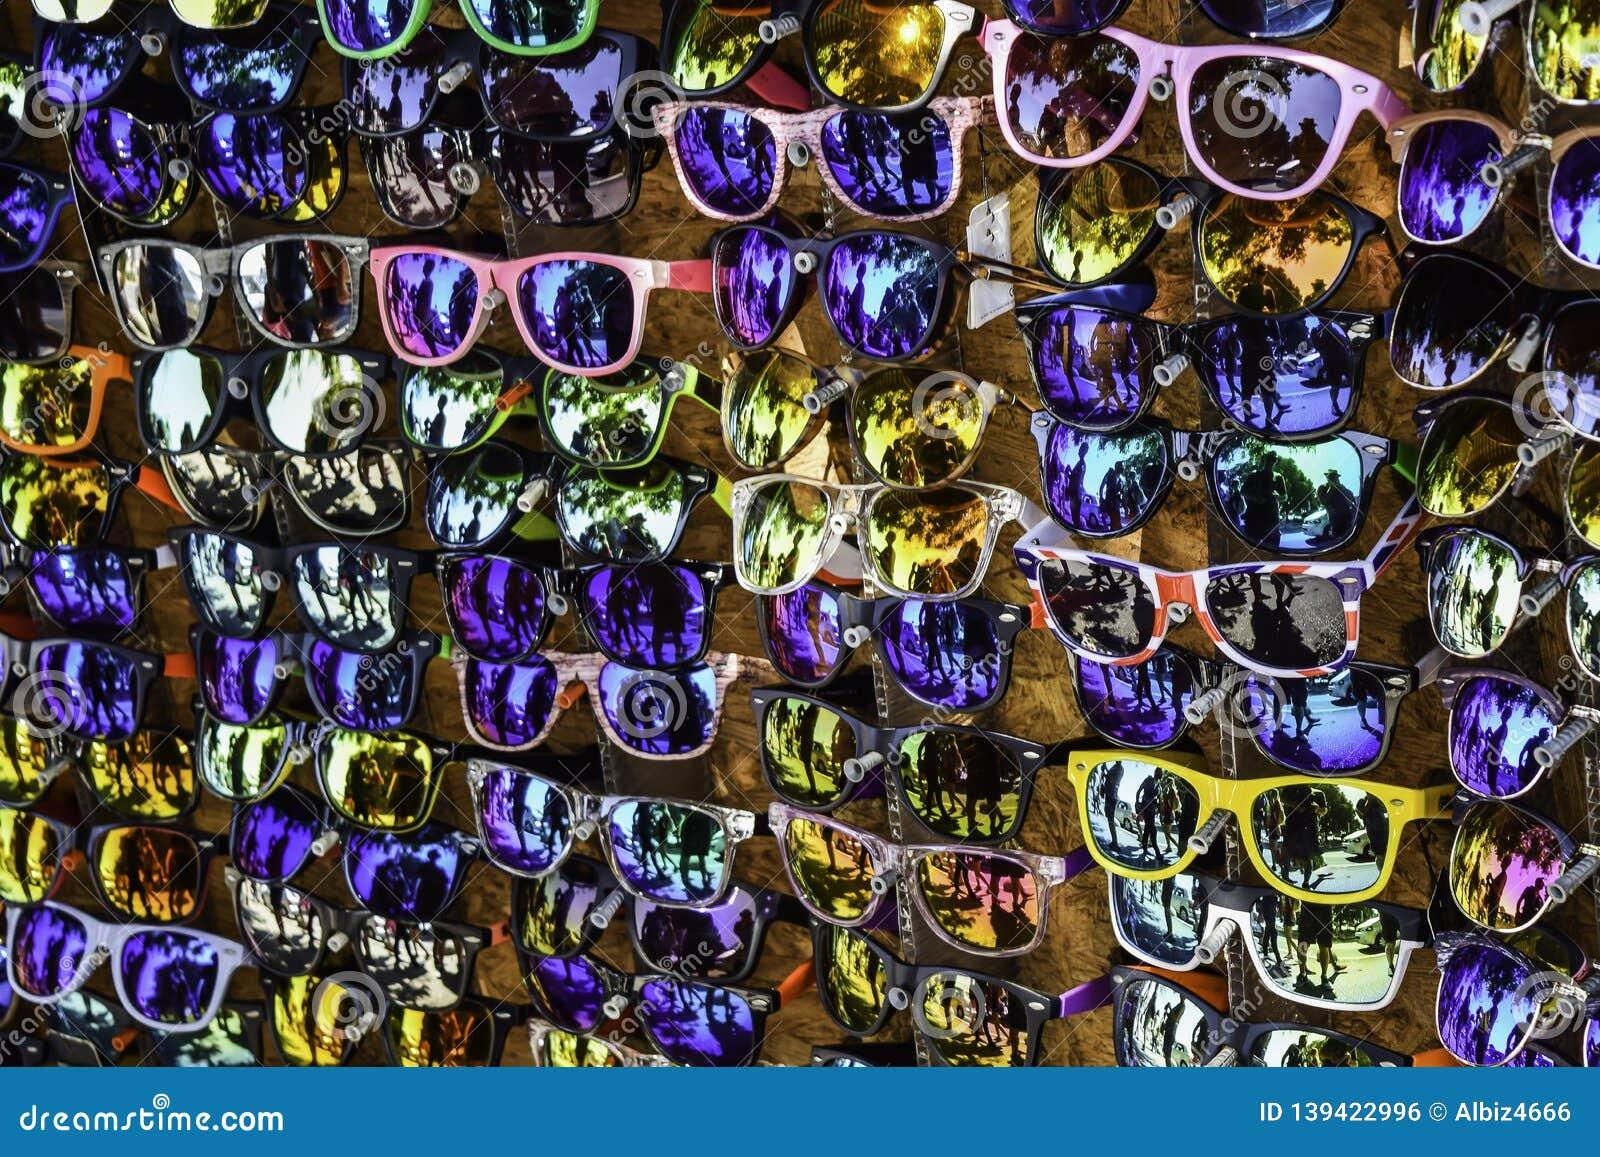 Many Sunglasses